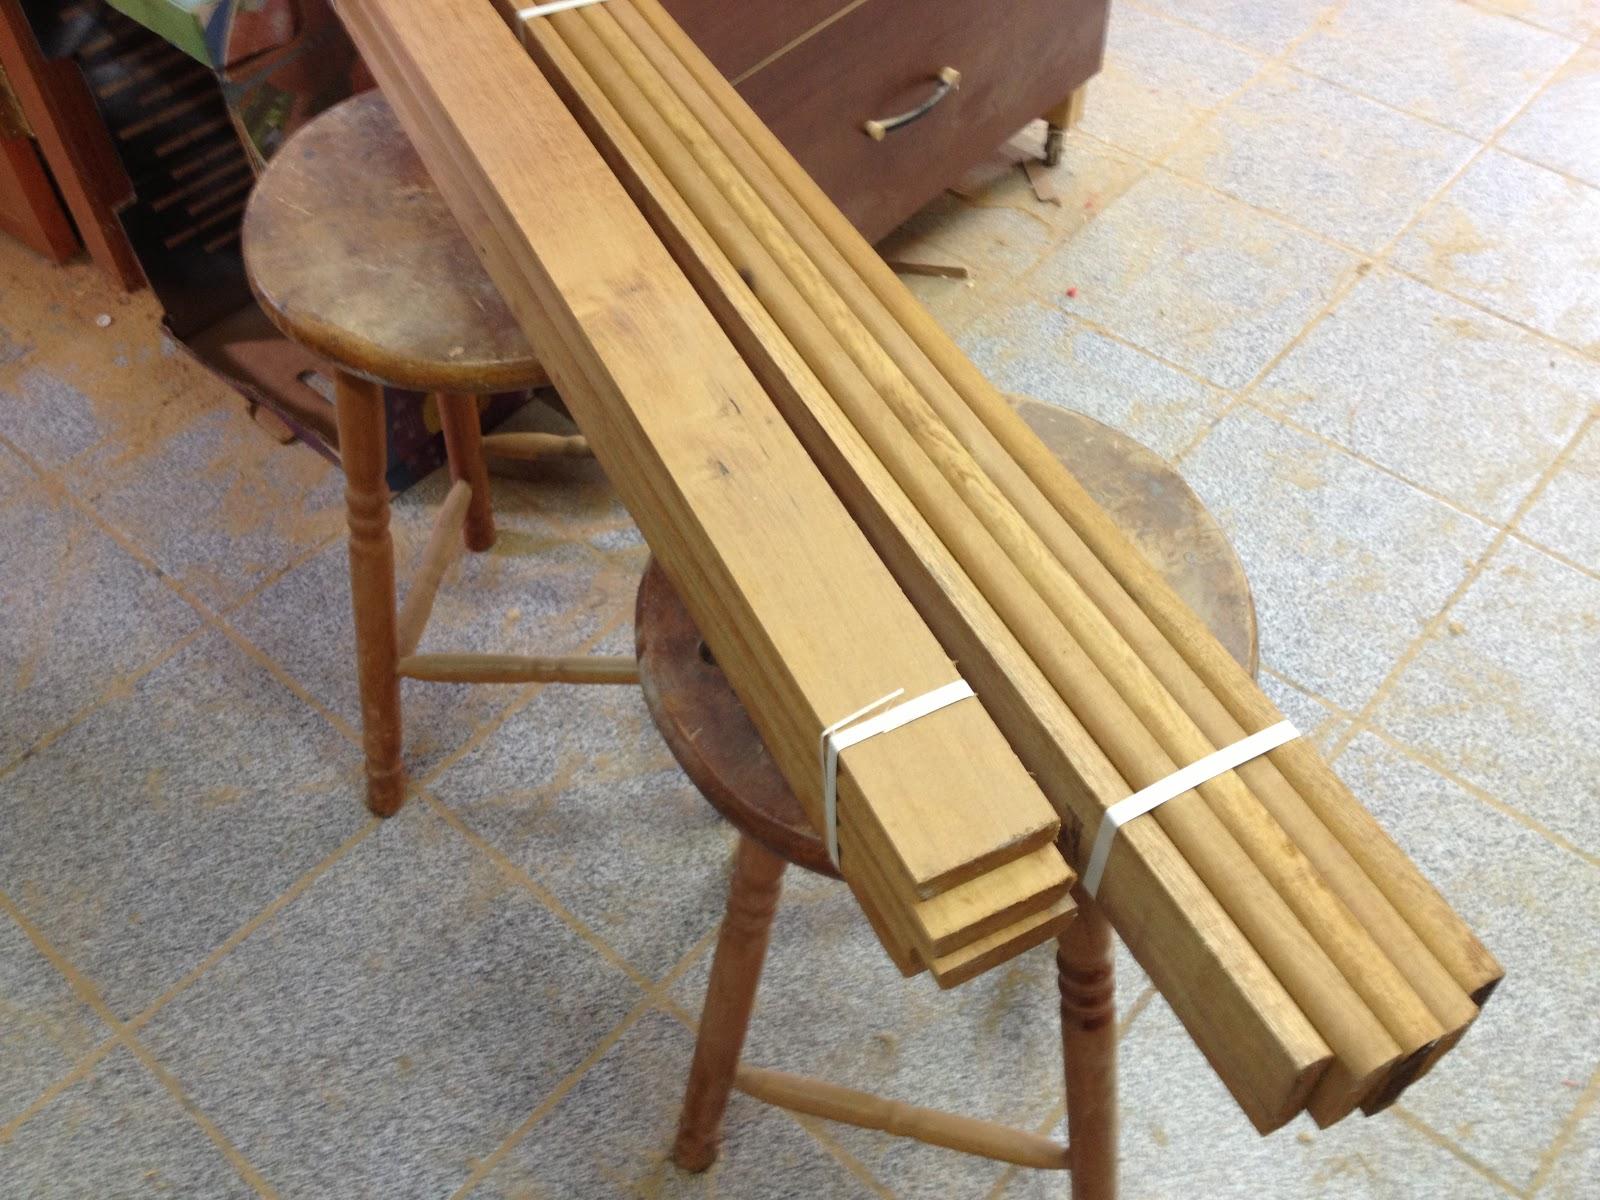 Atelier do Zero: Suporte de madeira para vasos #9E762D 1600x1200